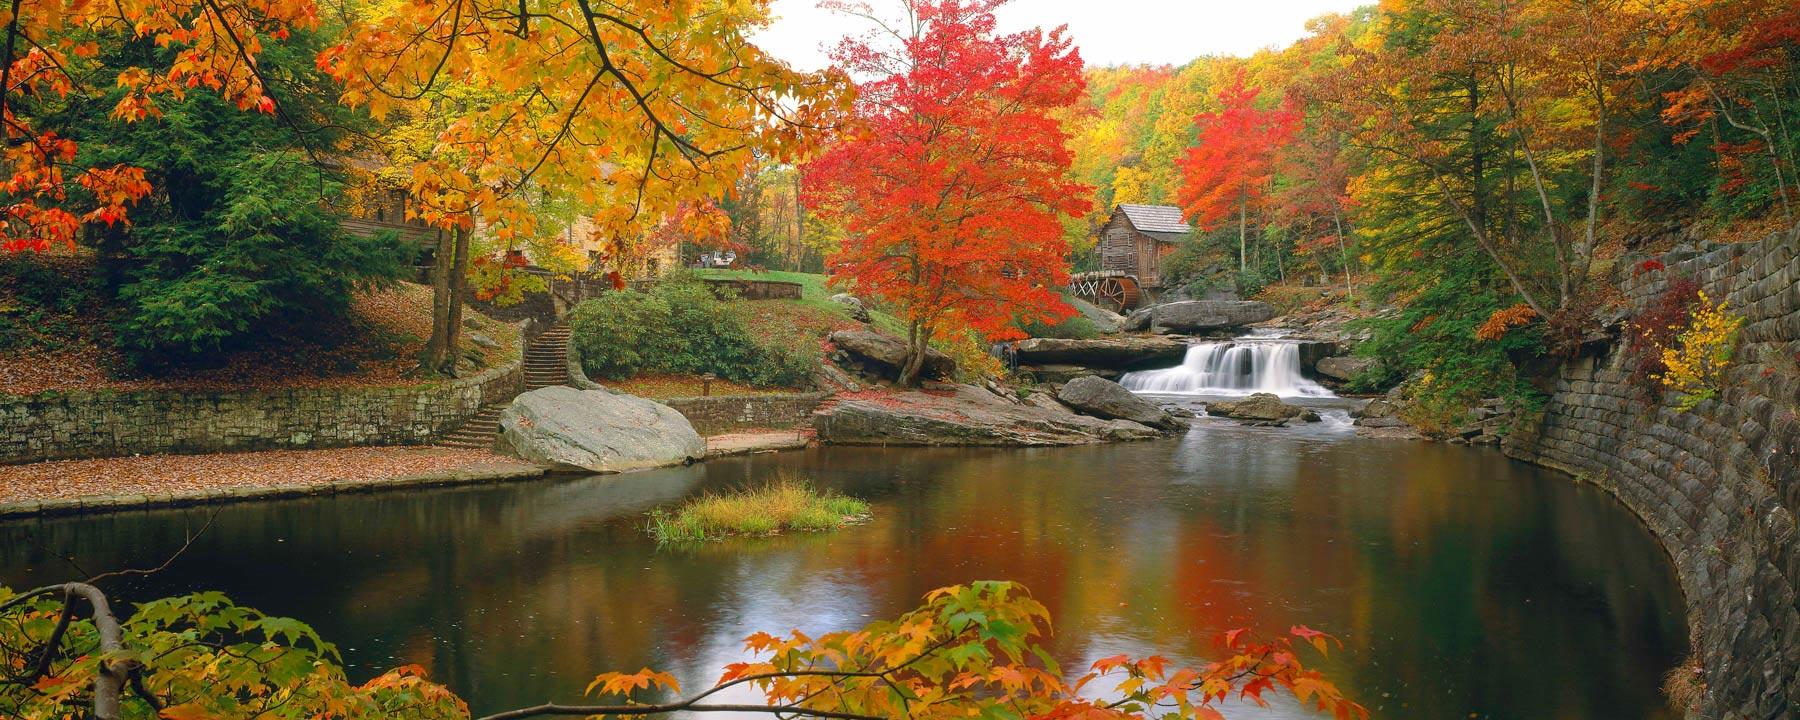 Glade Creek Grist Mill, West Virgina, USA